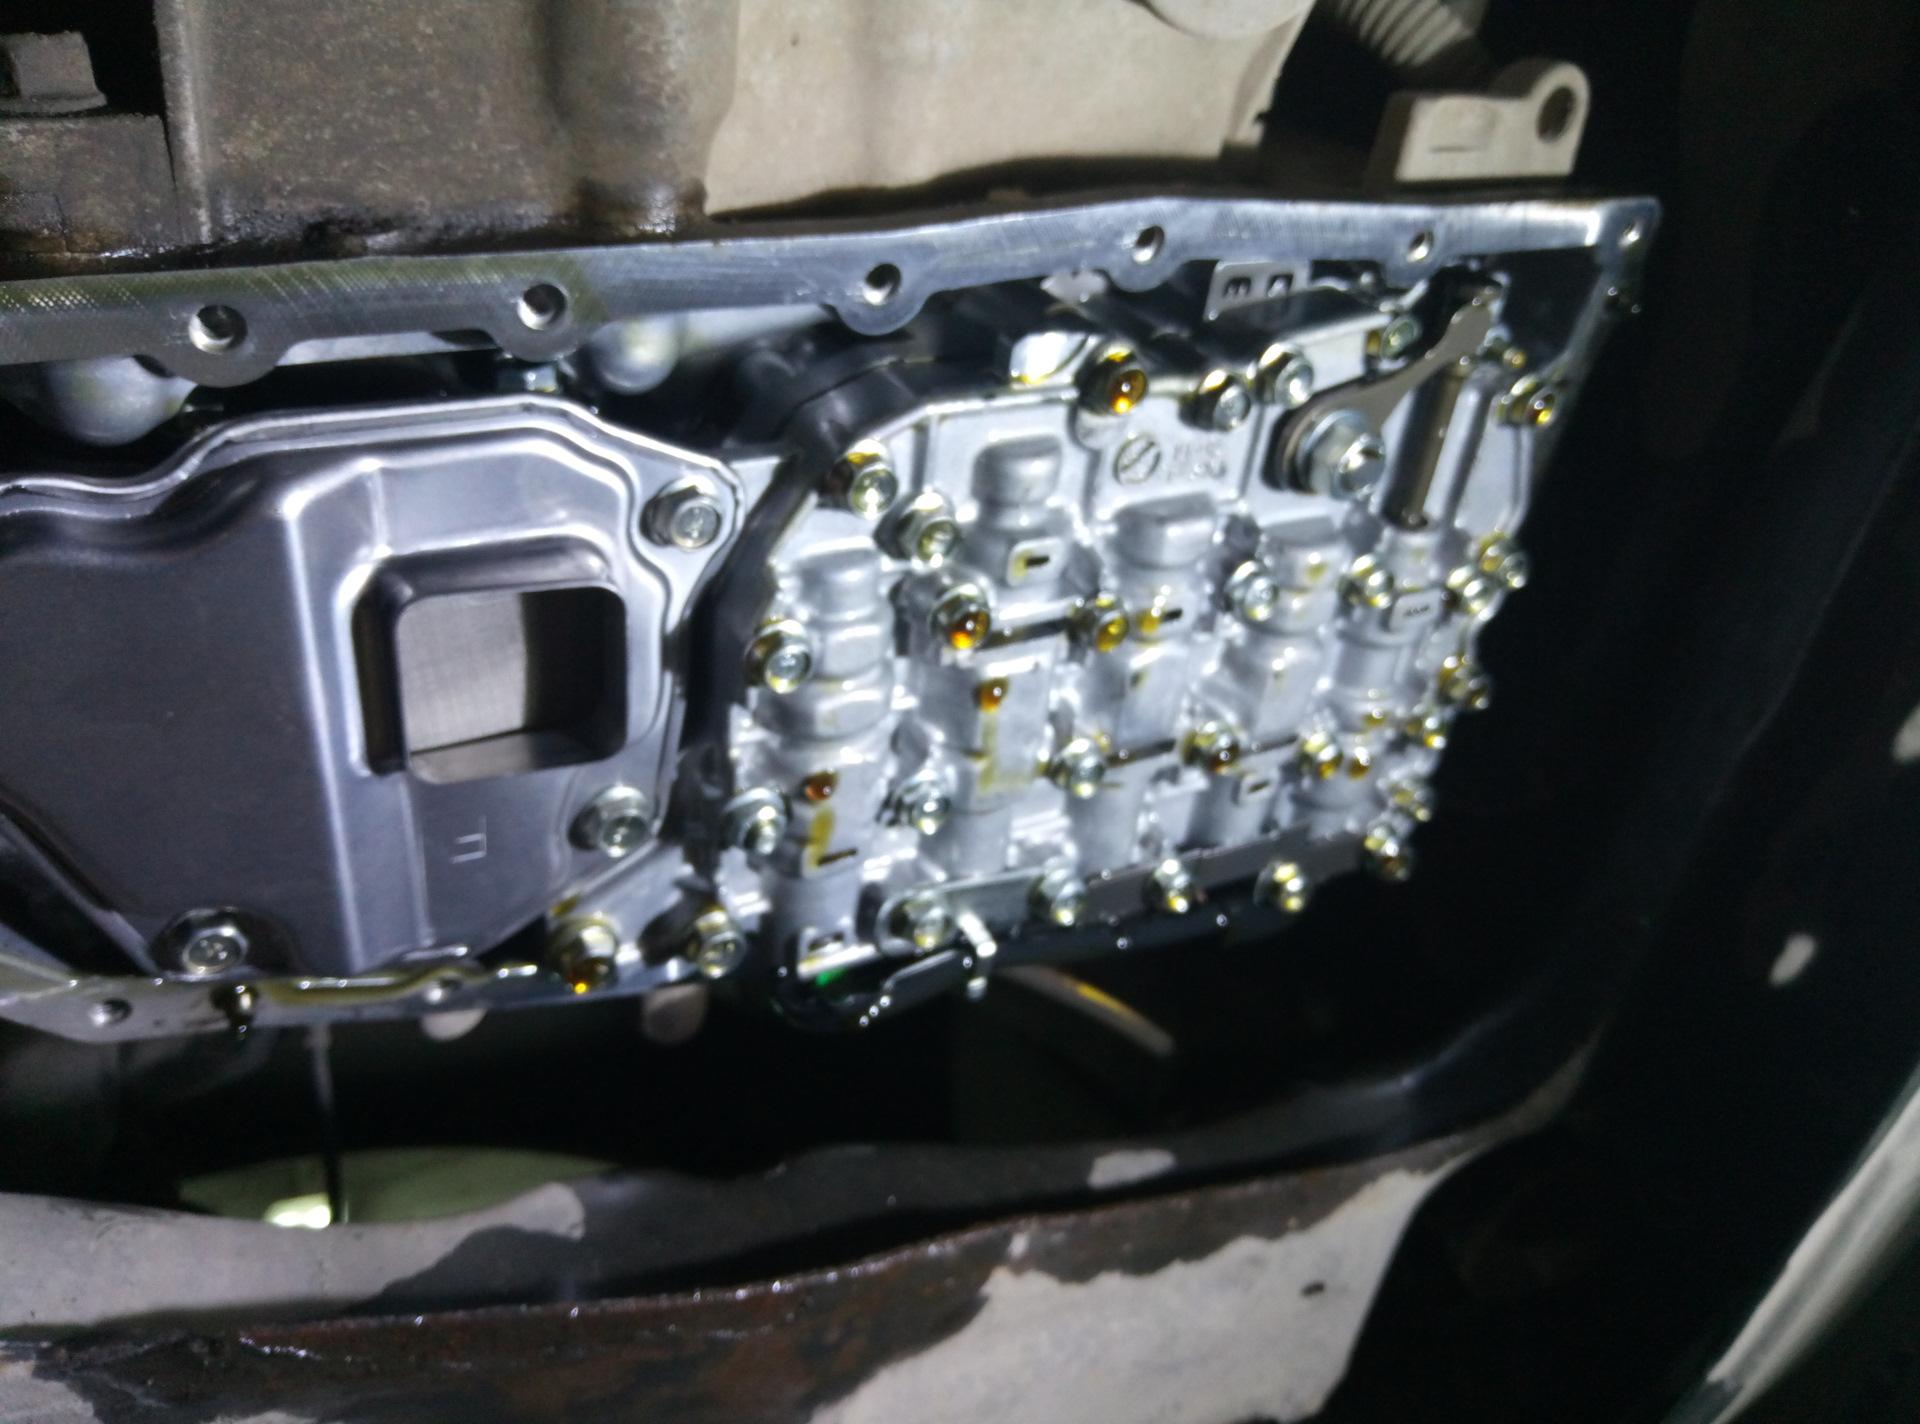 Замена прокладки теплообменника ниссан кашкай Пластины теплообменника Машимпэкс (GEA) NT 500M Хасавюрт